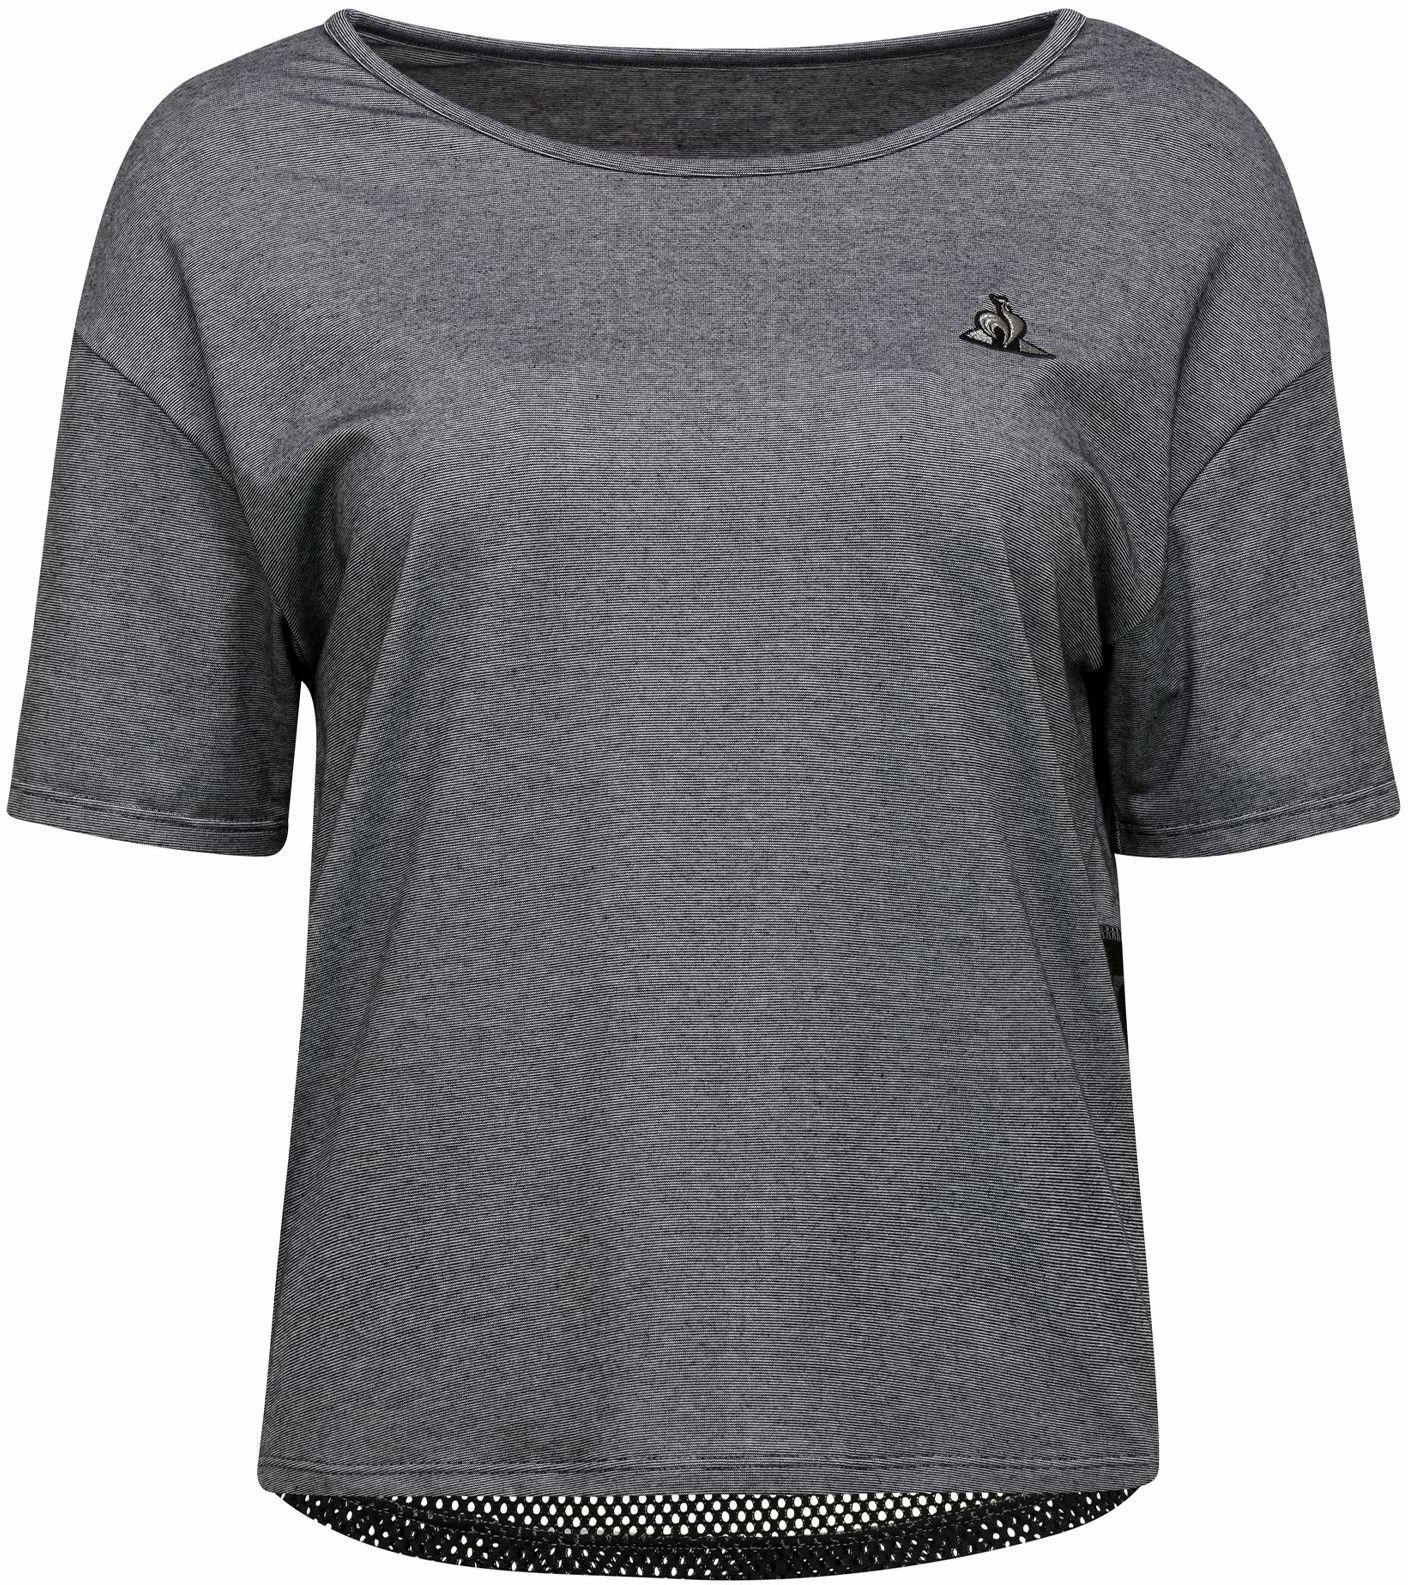 Le Coq Sportif Damska koszulka Tech Tee Loose Ss N 2 podkoszulek, szare chiné, rozmiar M